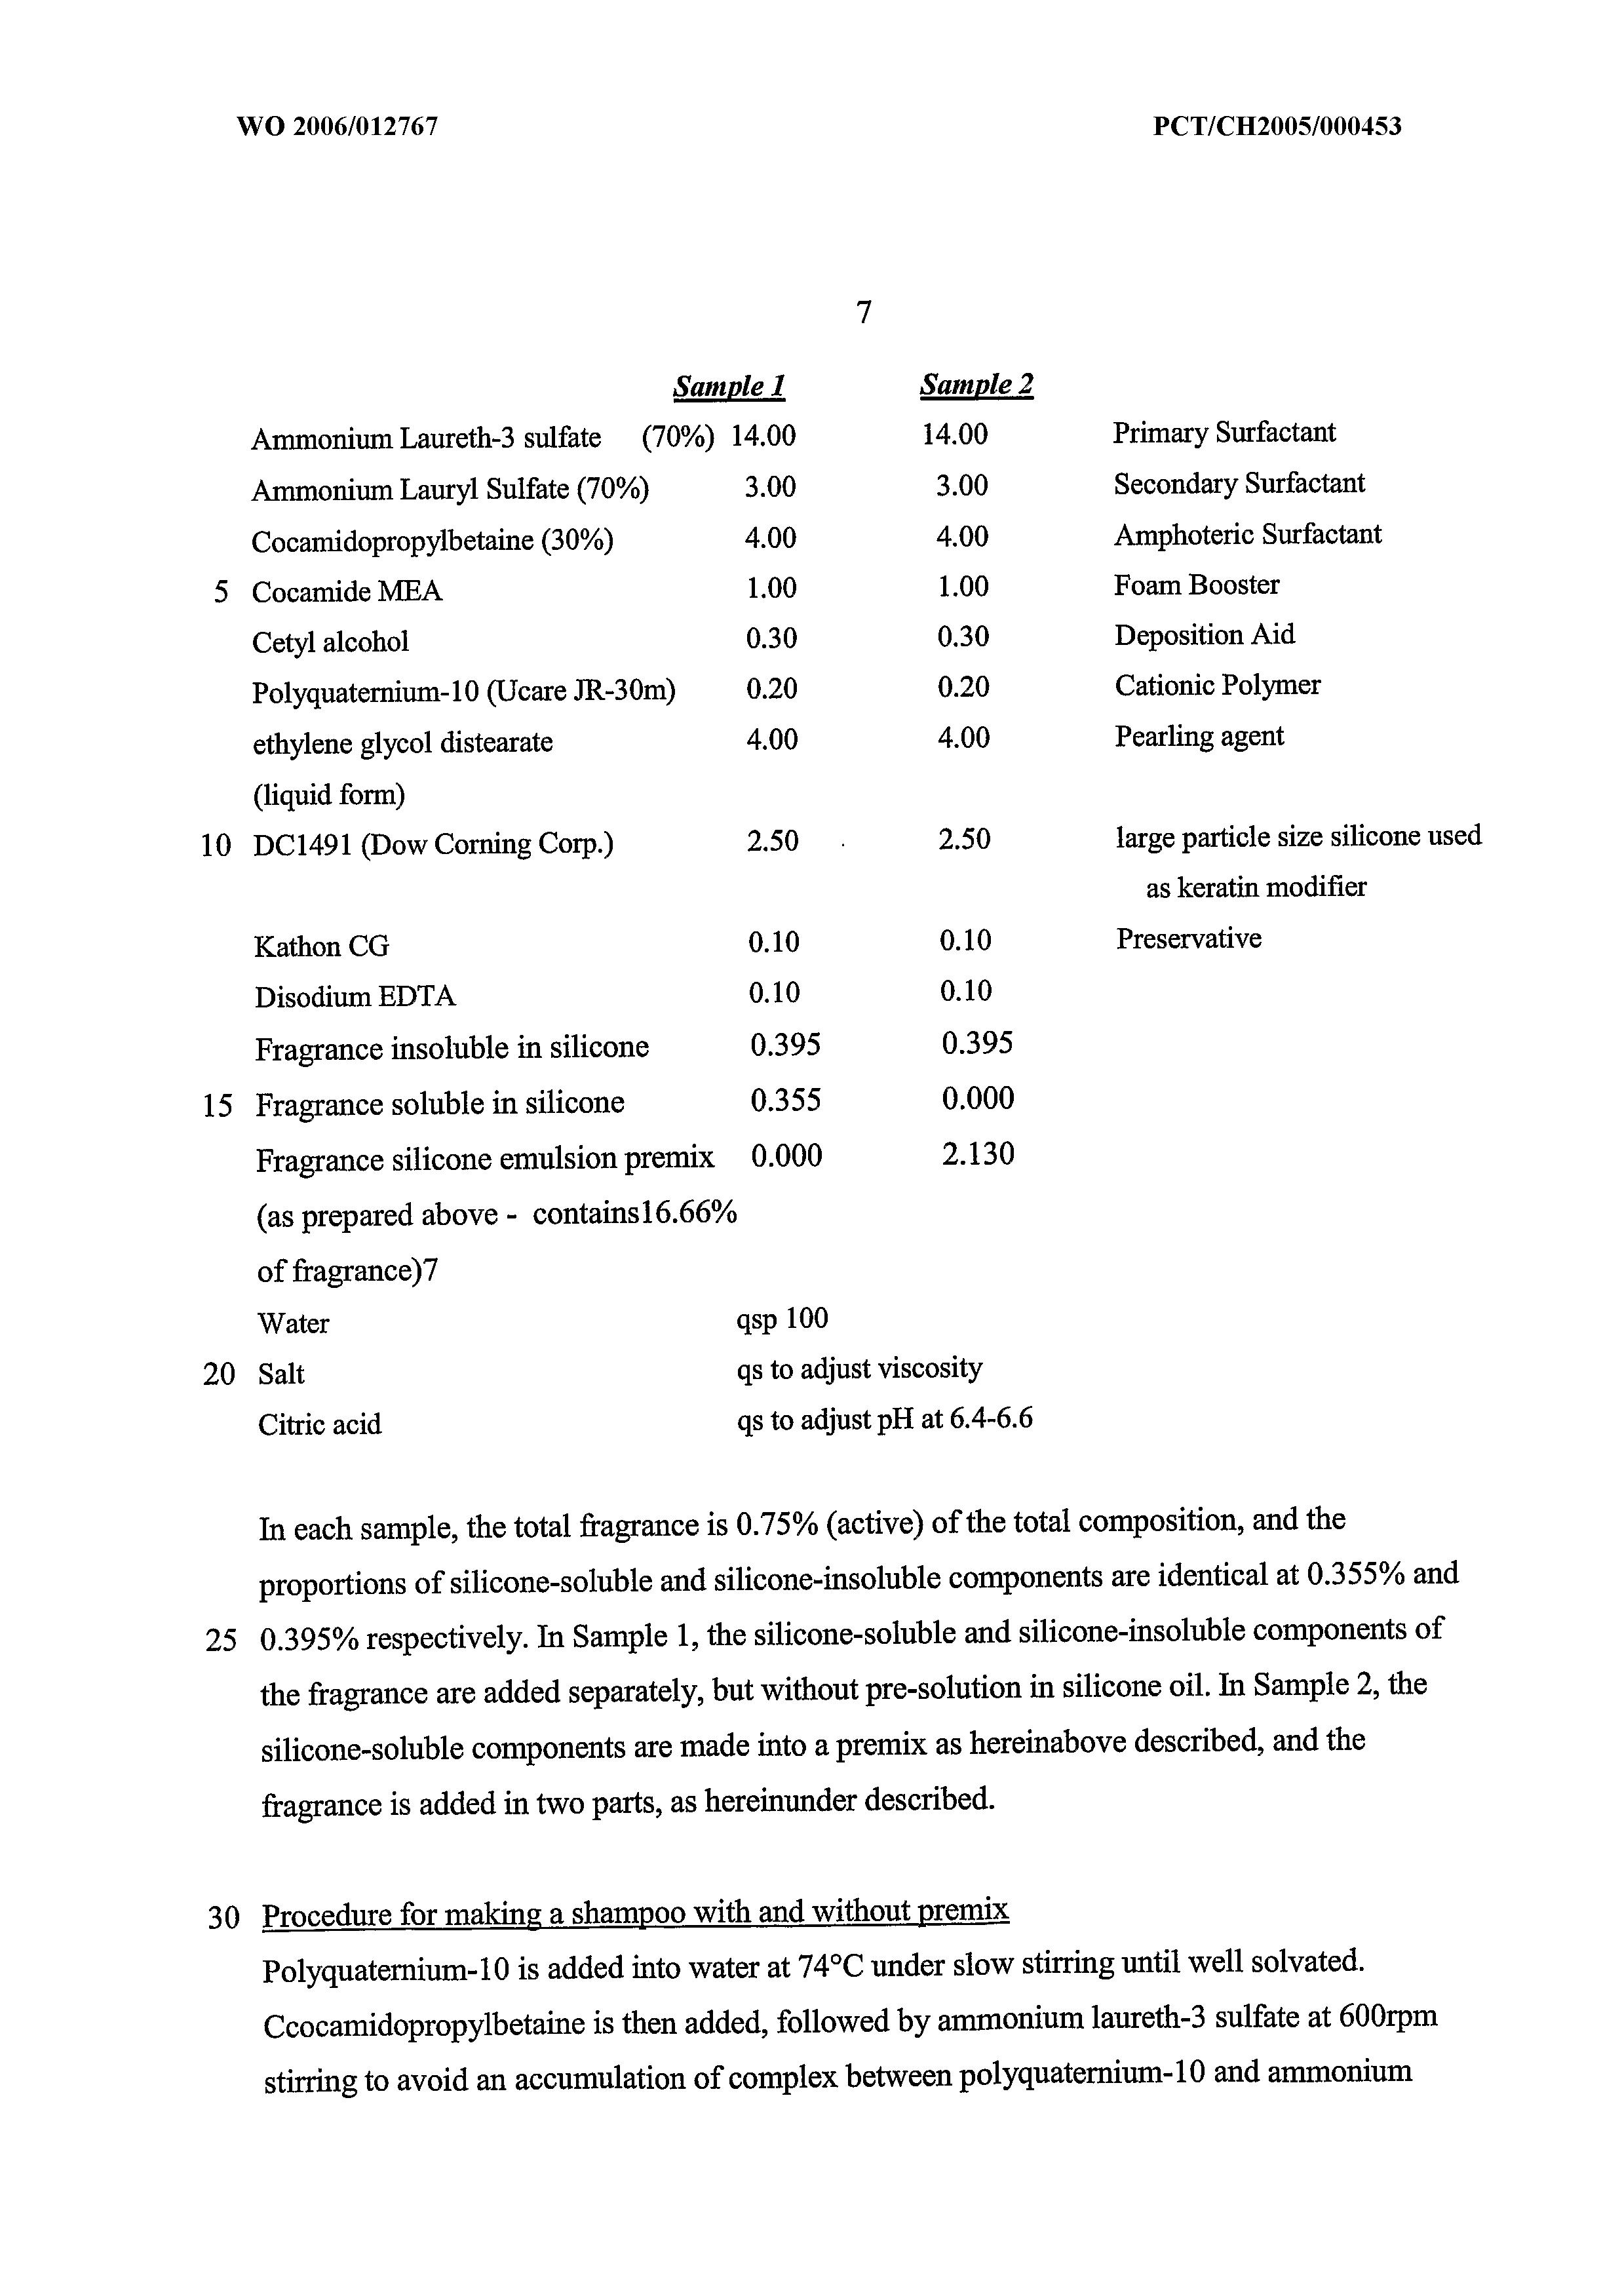 WO 2006/012767 A1 - Composition Comprising Fragrance